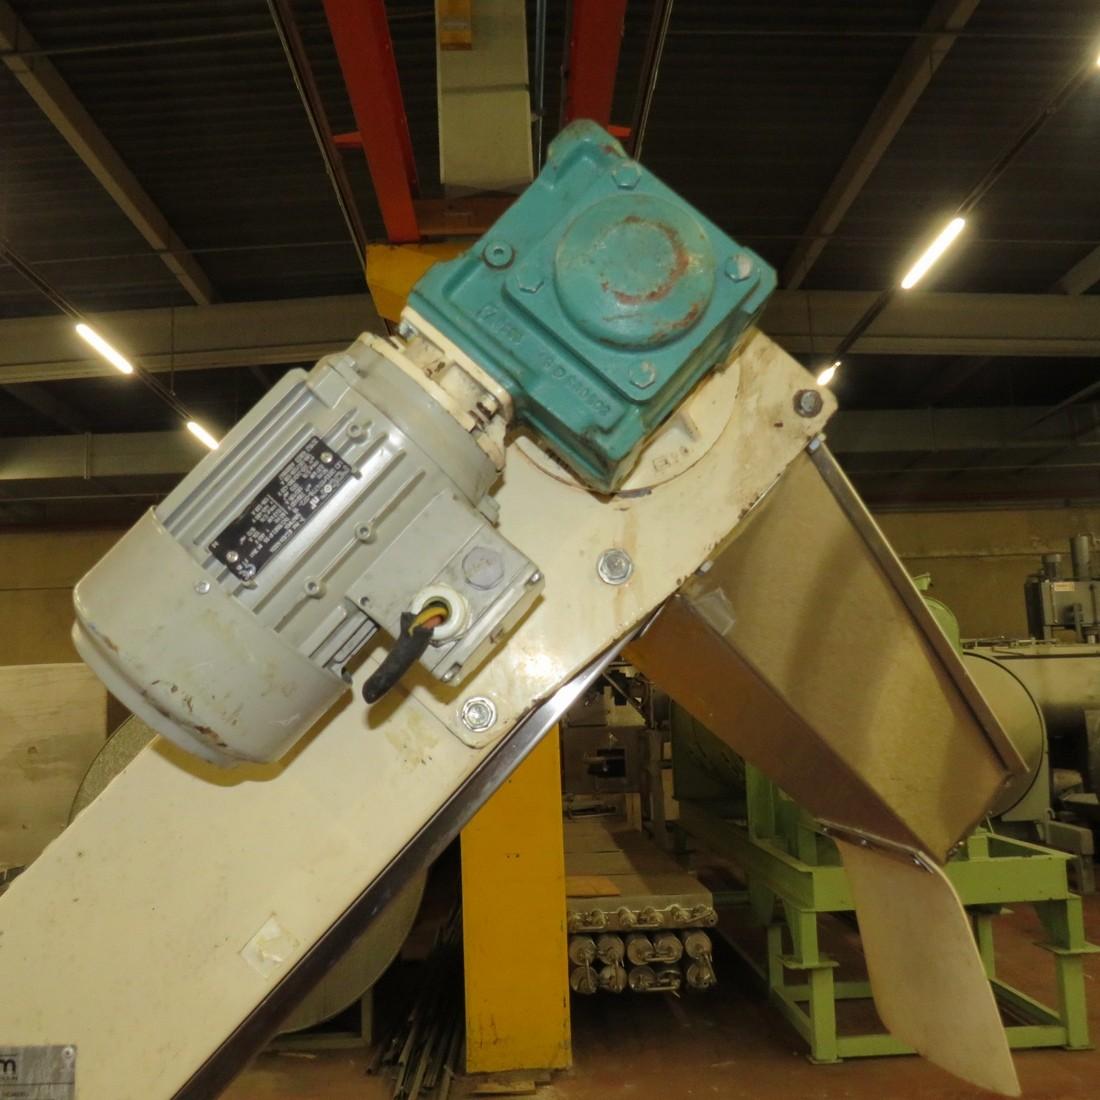 R4FB1179 SOCOM elevator conveyor width 530mm - height 1580mm